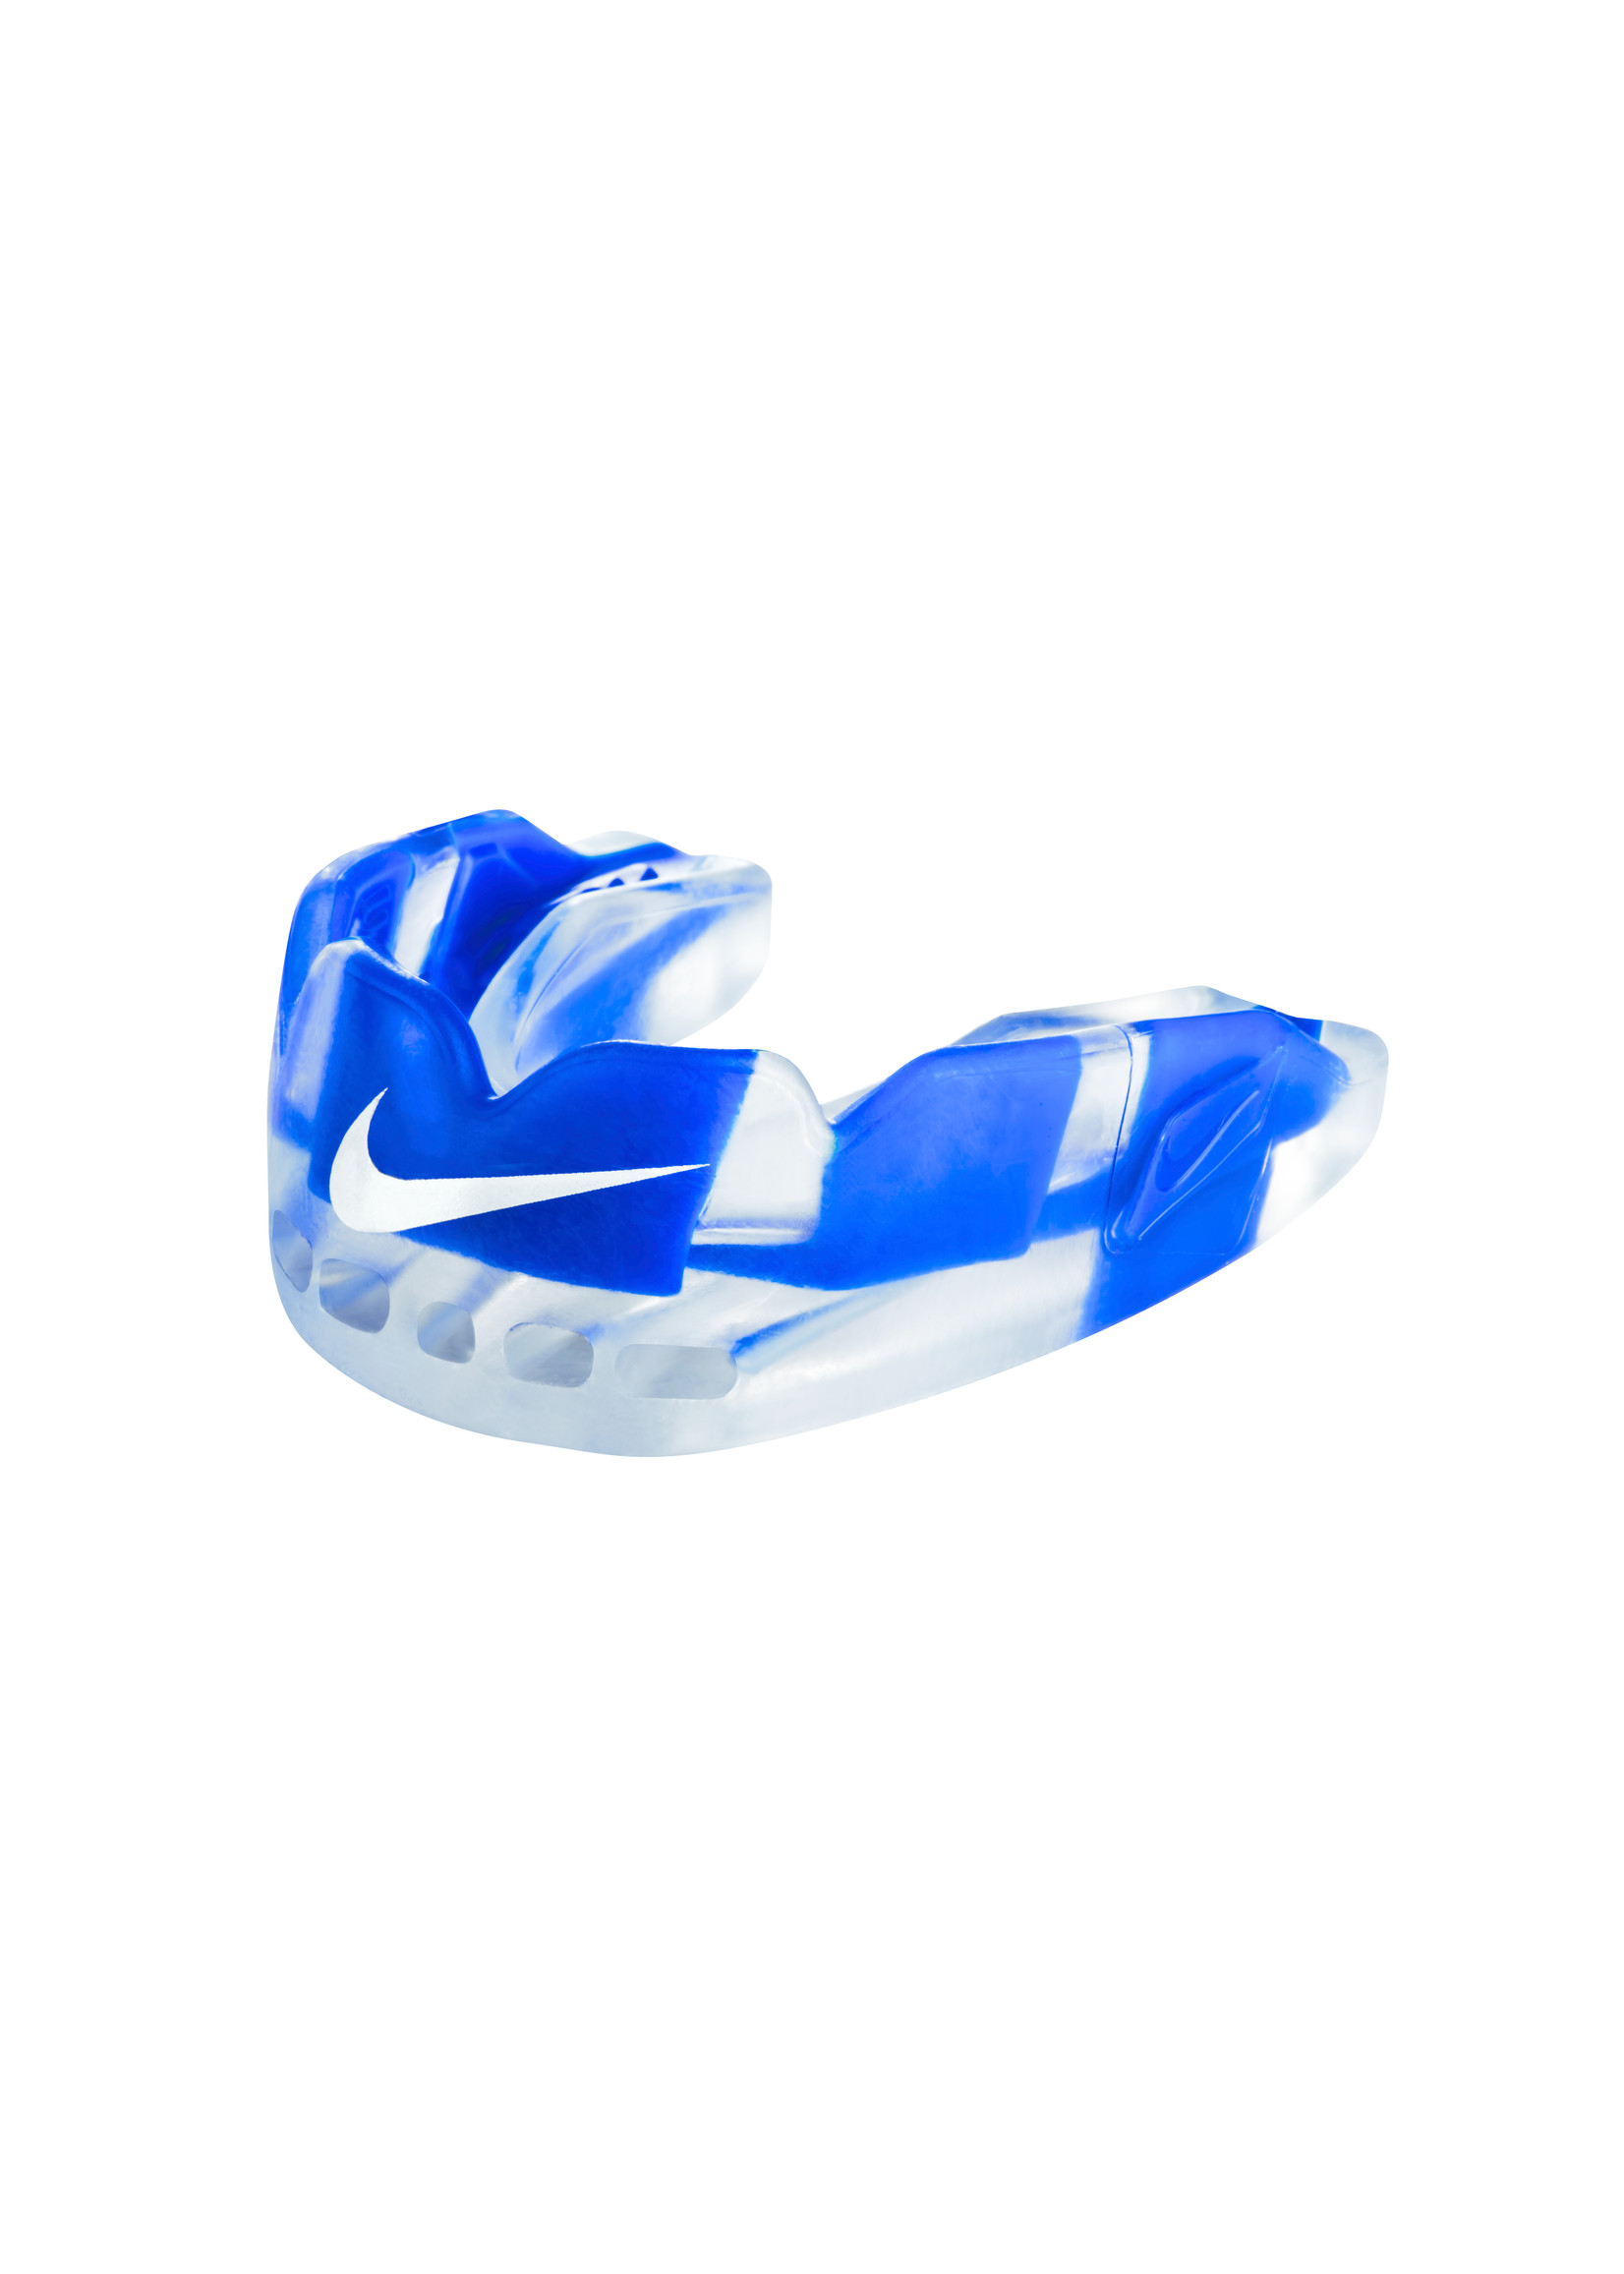 Nike Hyperflow MouthGuard Youth Clear/Royal/White